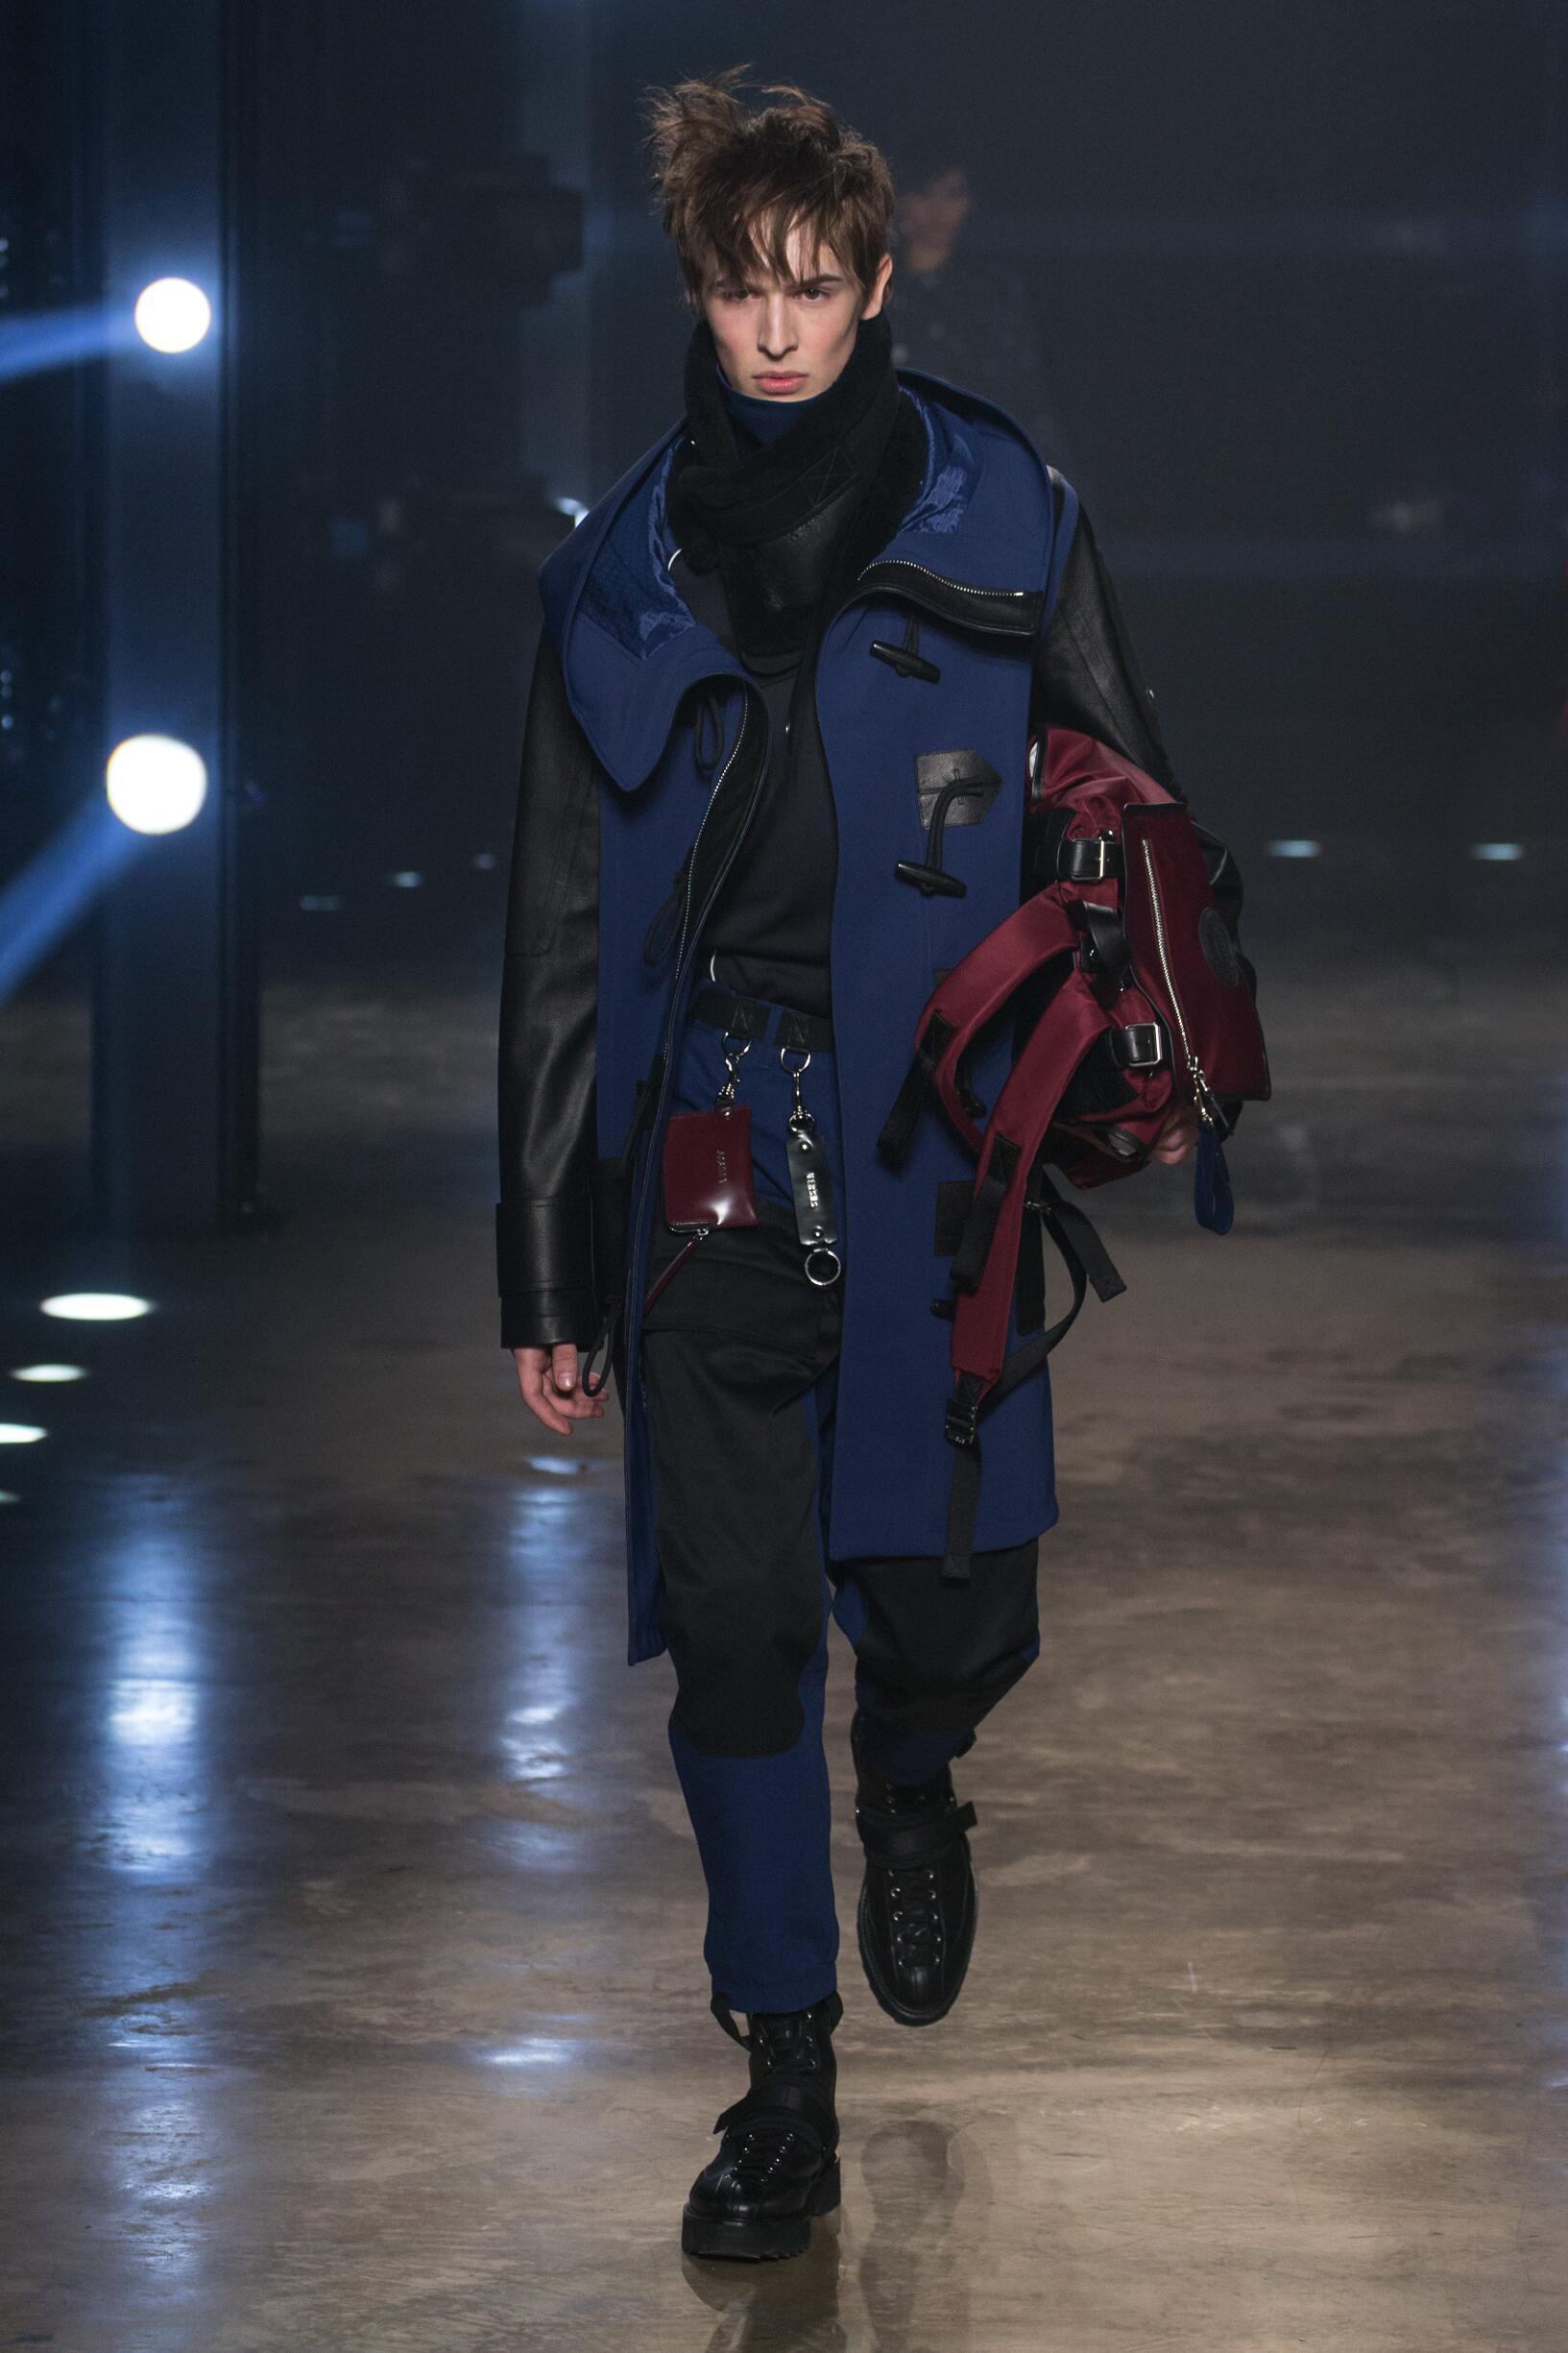 Versus Versace Man Style 2018